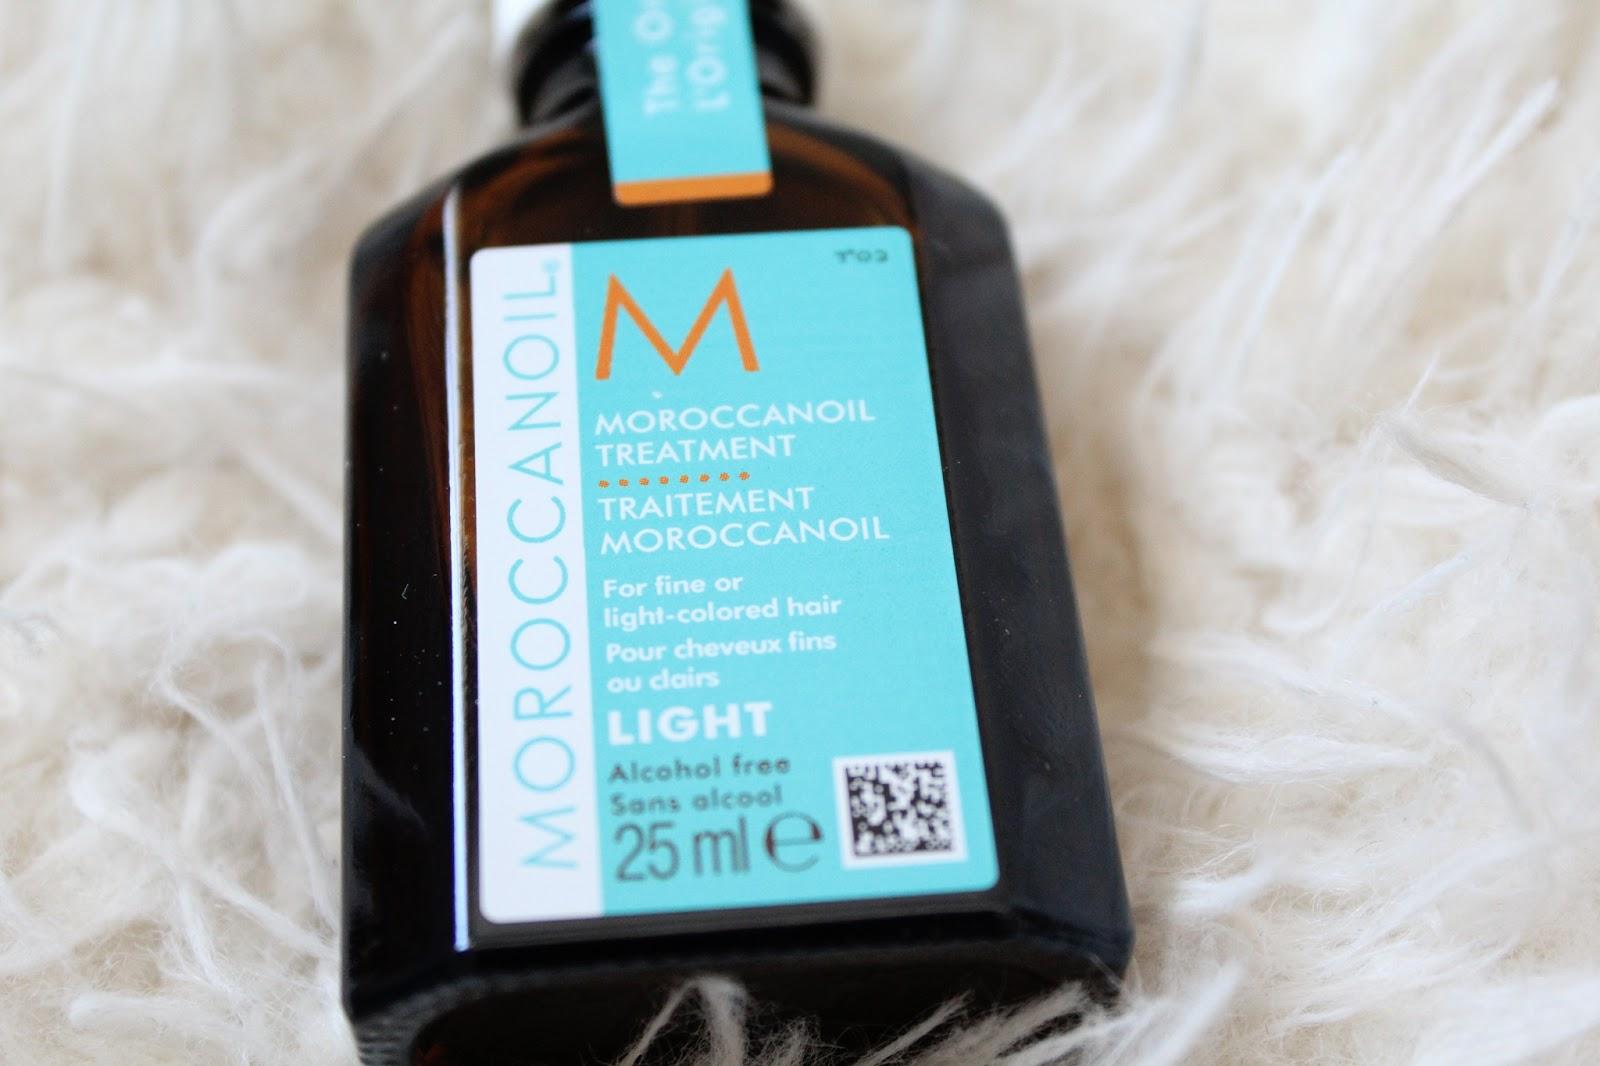 Moroccan Oil Light Treatment